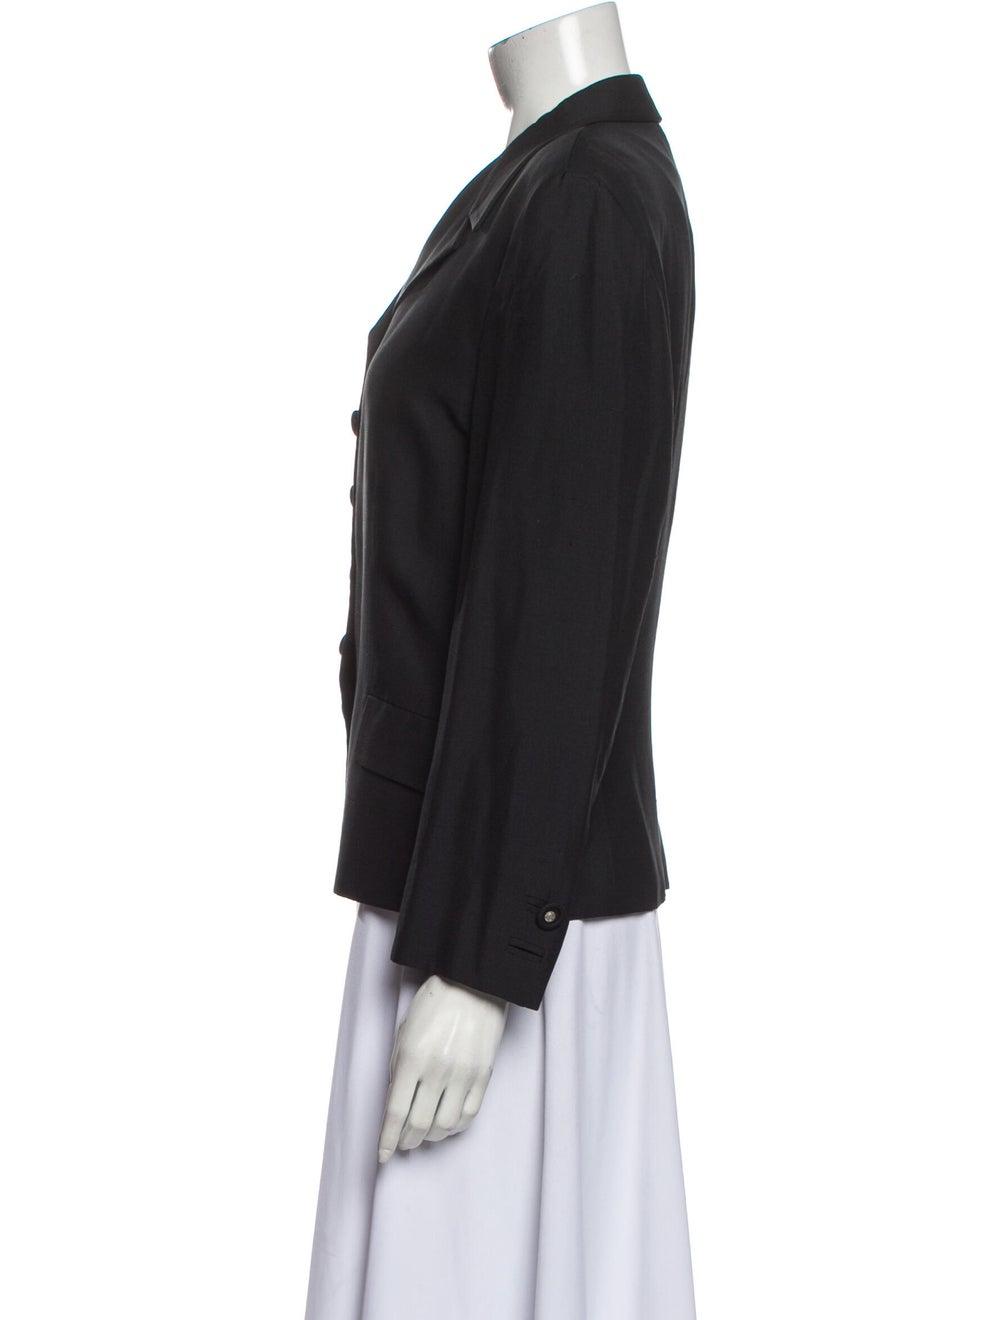 Gianni Versace Vintage Blazer Black - image 2